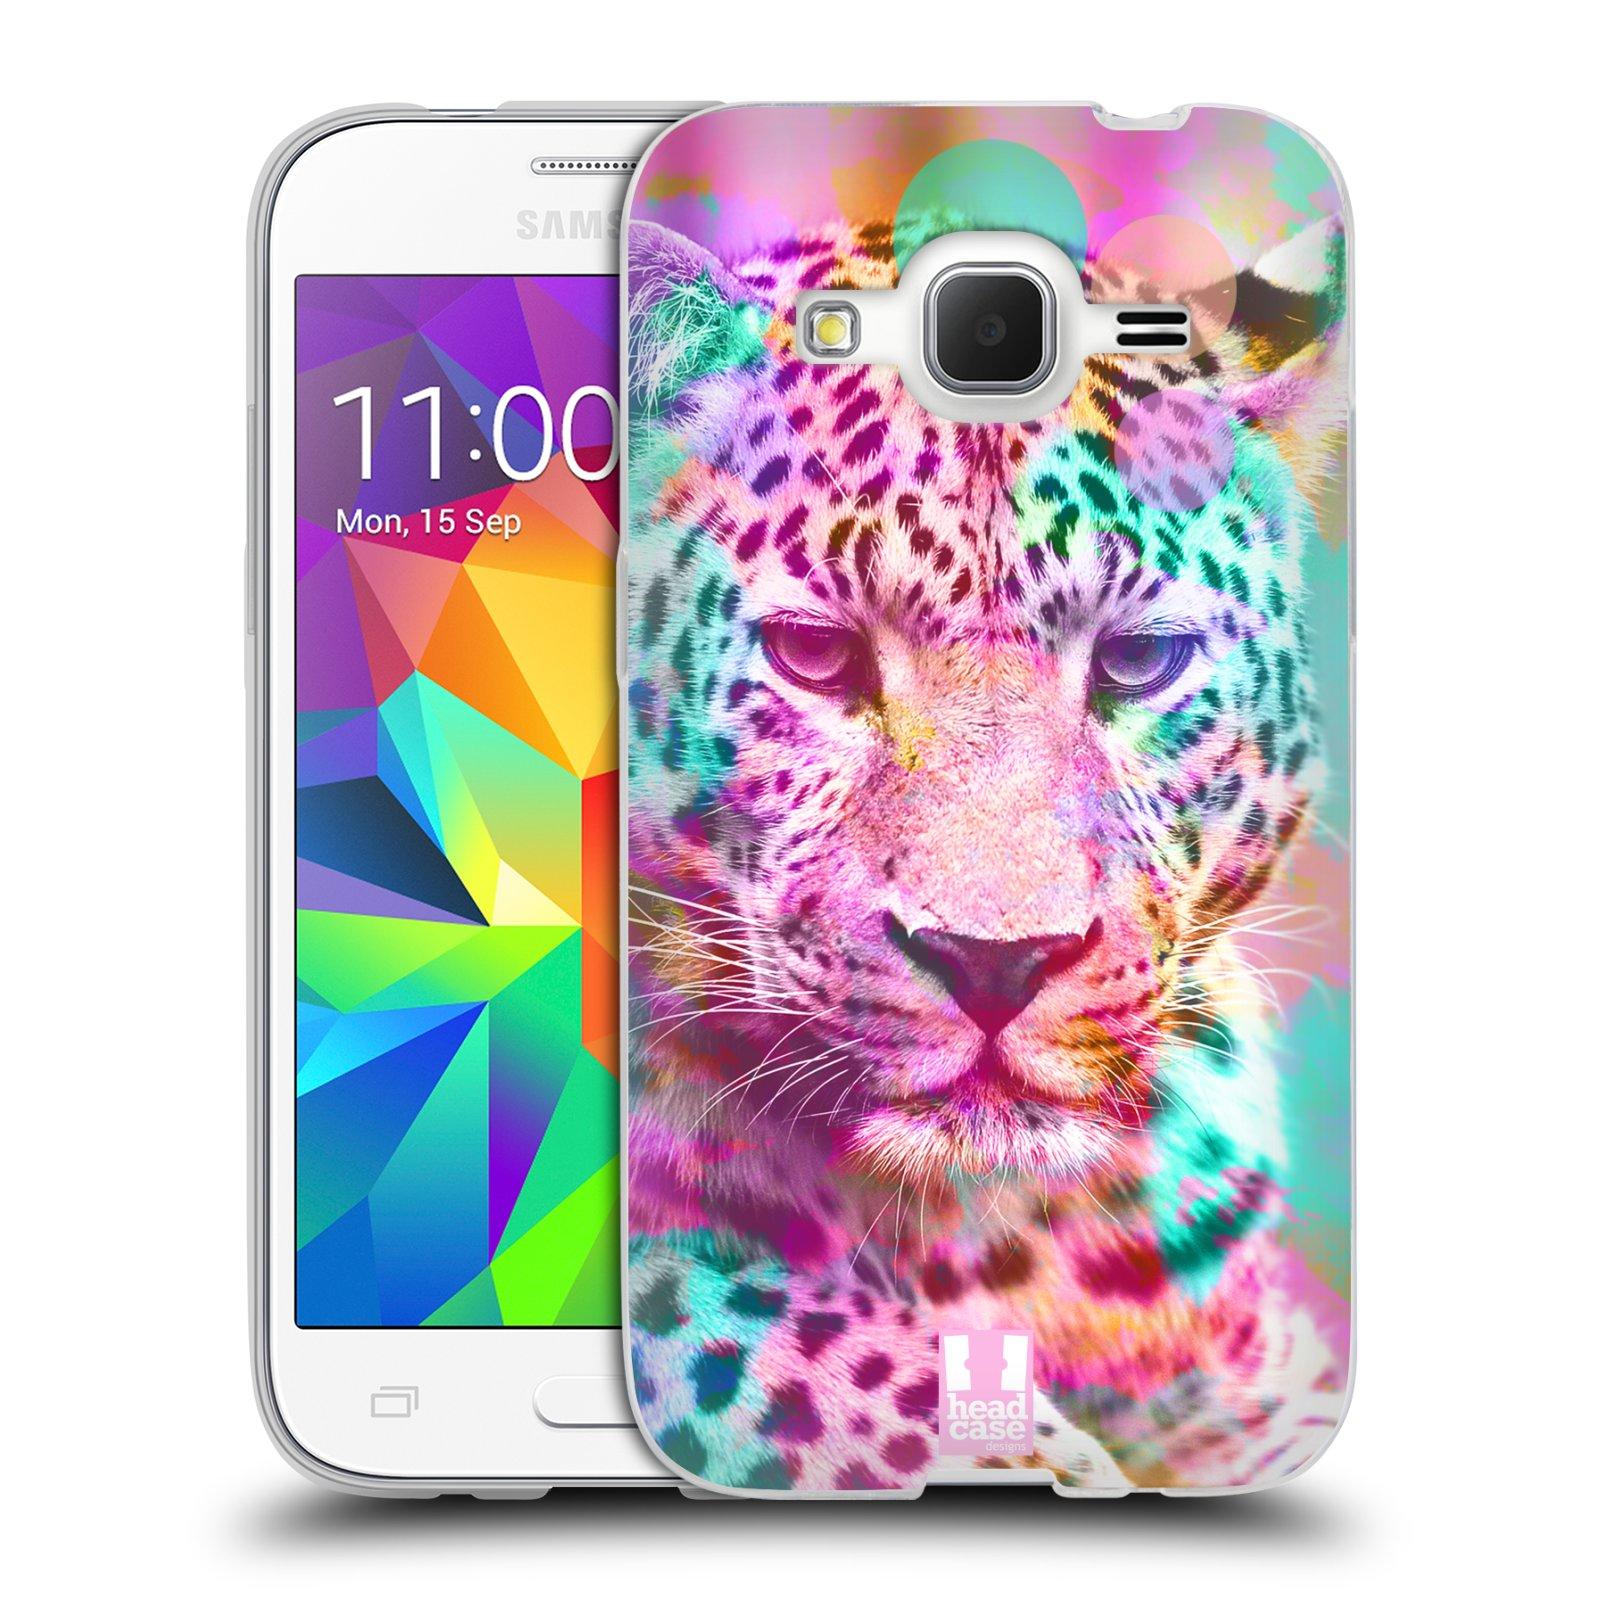 Silikonové pouzdro na mobil Samsung Galaxy Core Prime VE HEAD CASE MIX LEOPARD